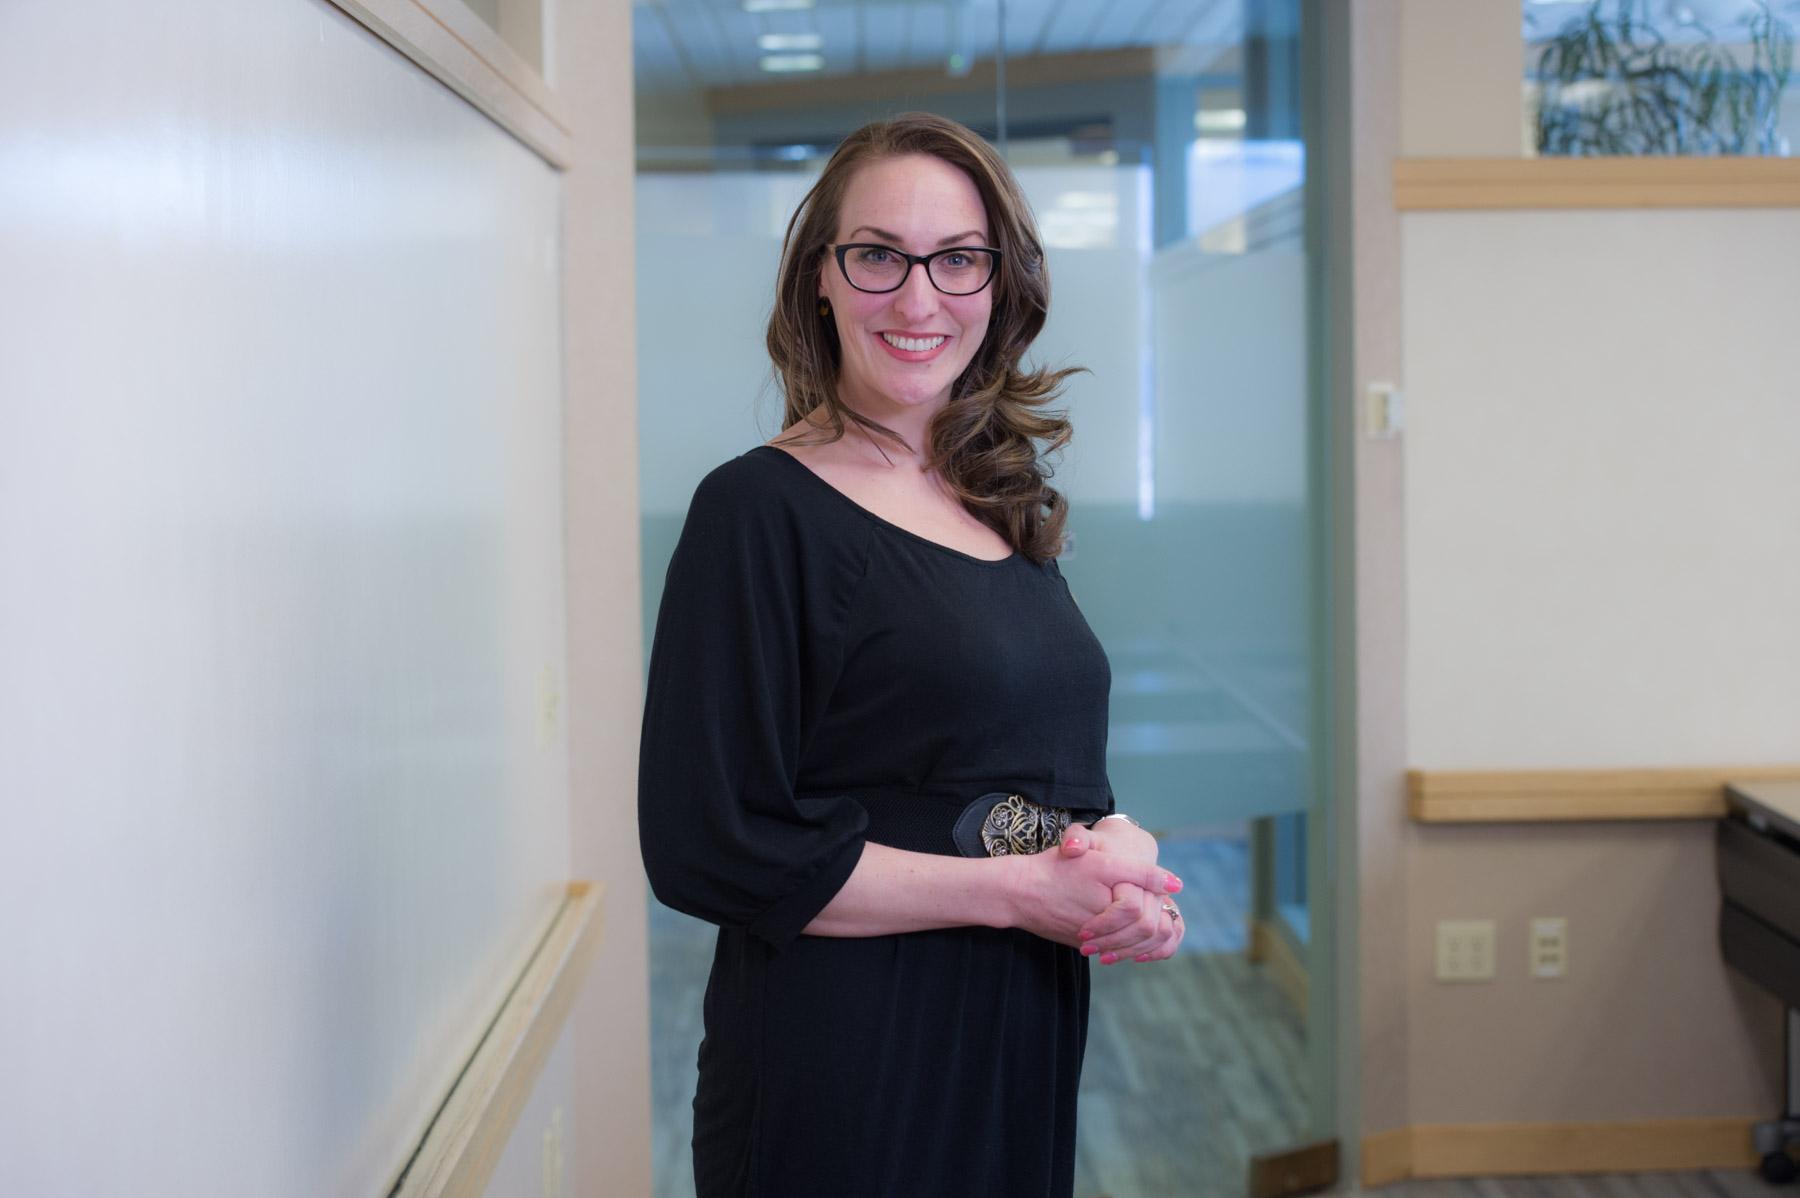 Caitlyn Kennedy of DOWL Engineering